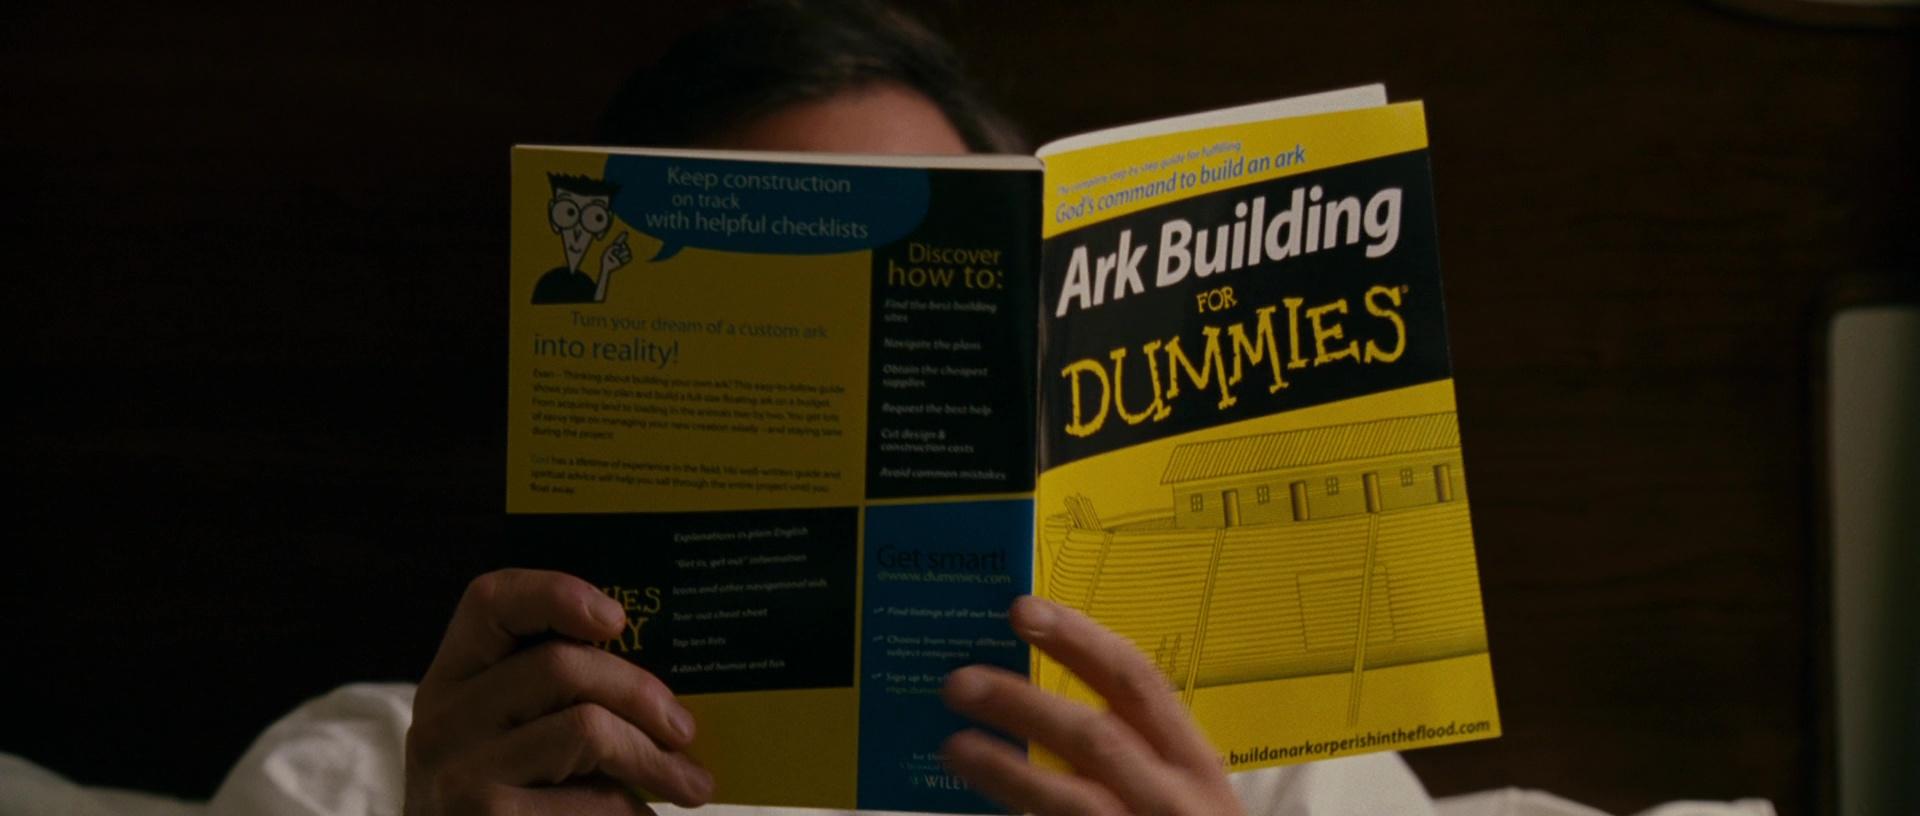 ark building for dummies book in evan almighty 2007 movie. Black Bedroom Furniture Sets. Home Design Ideas